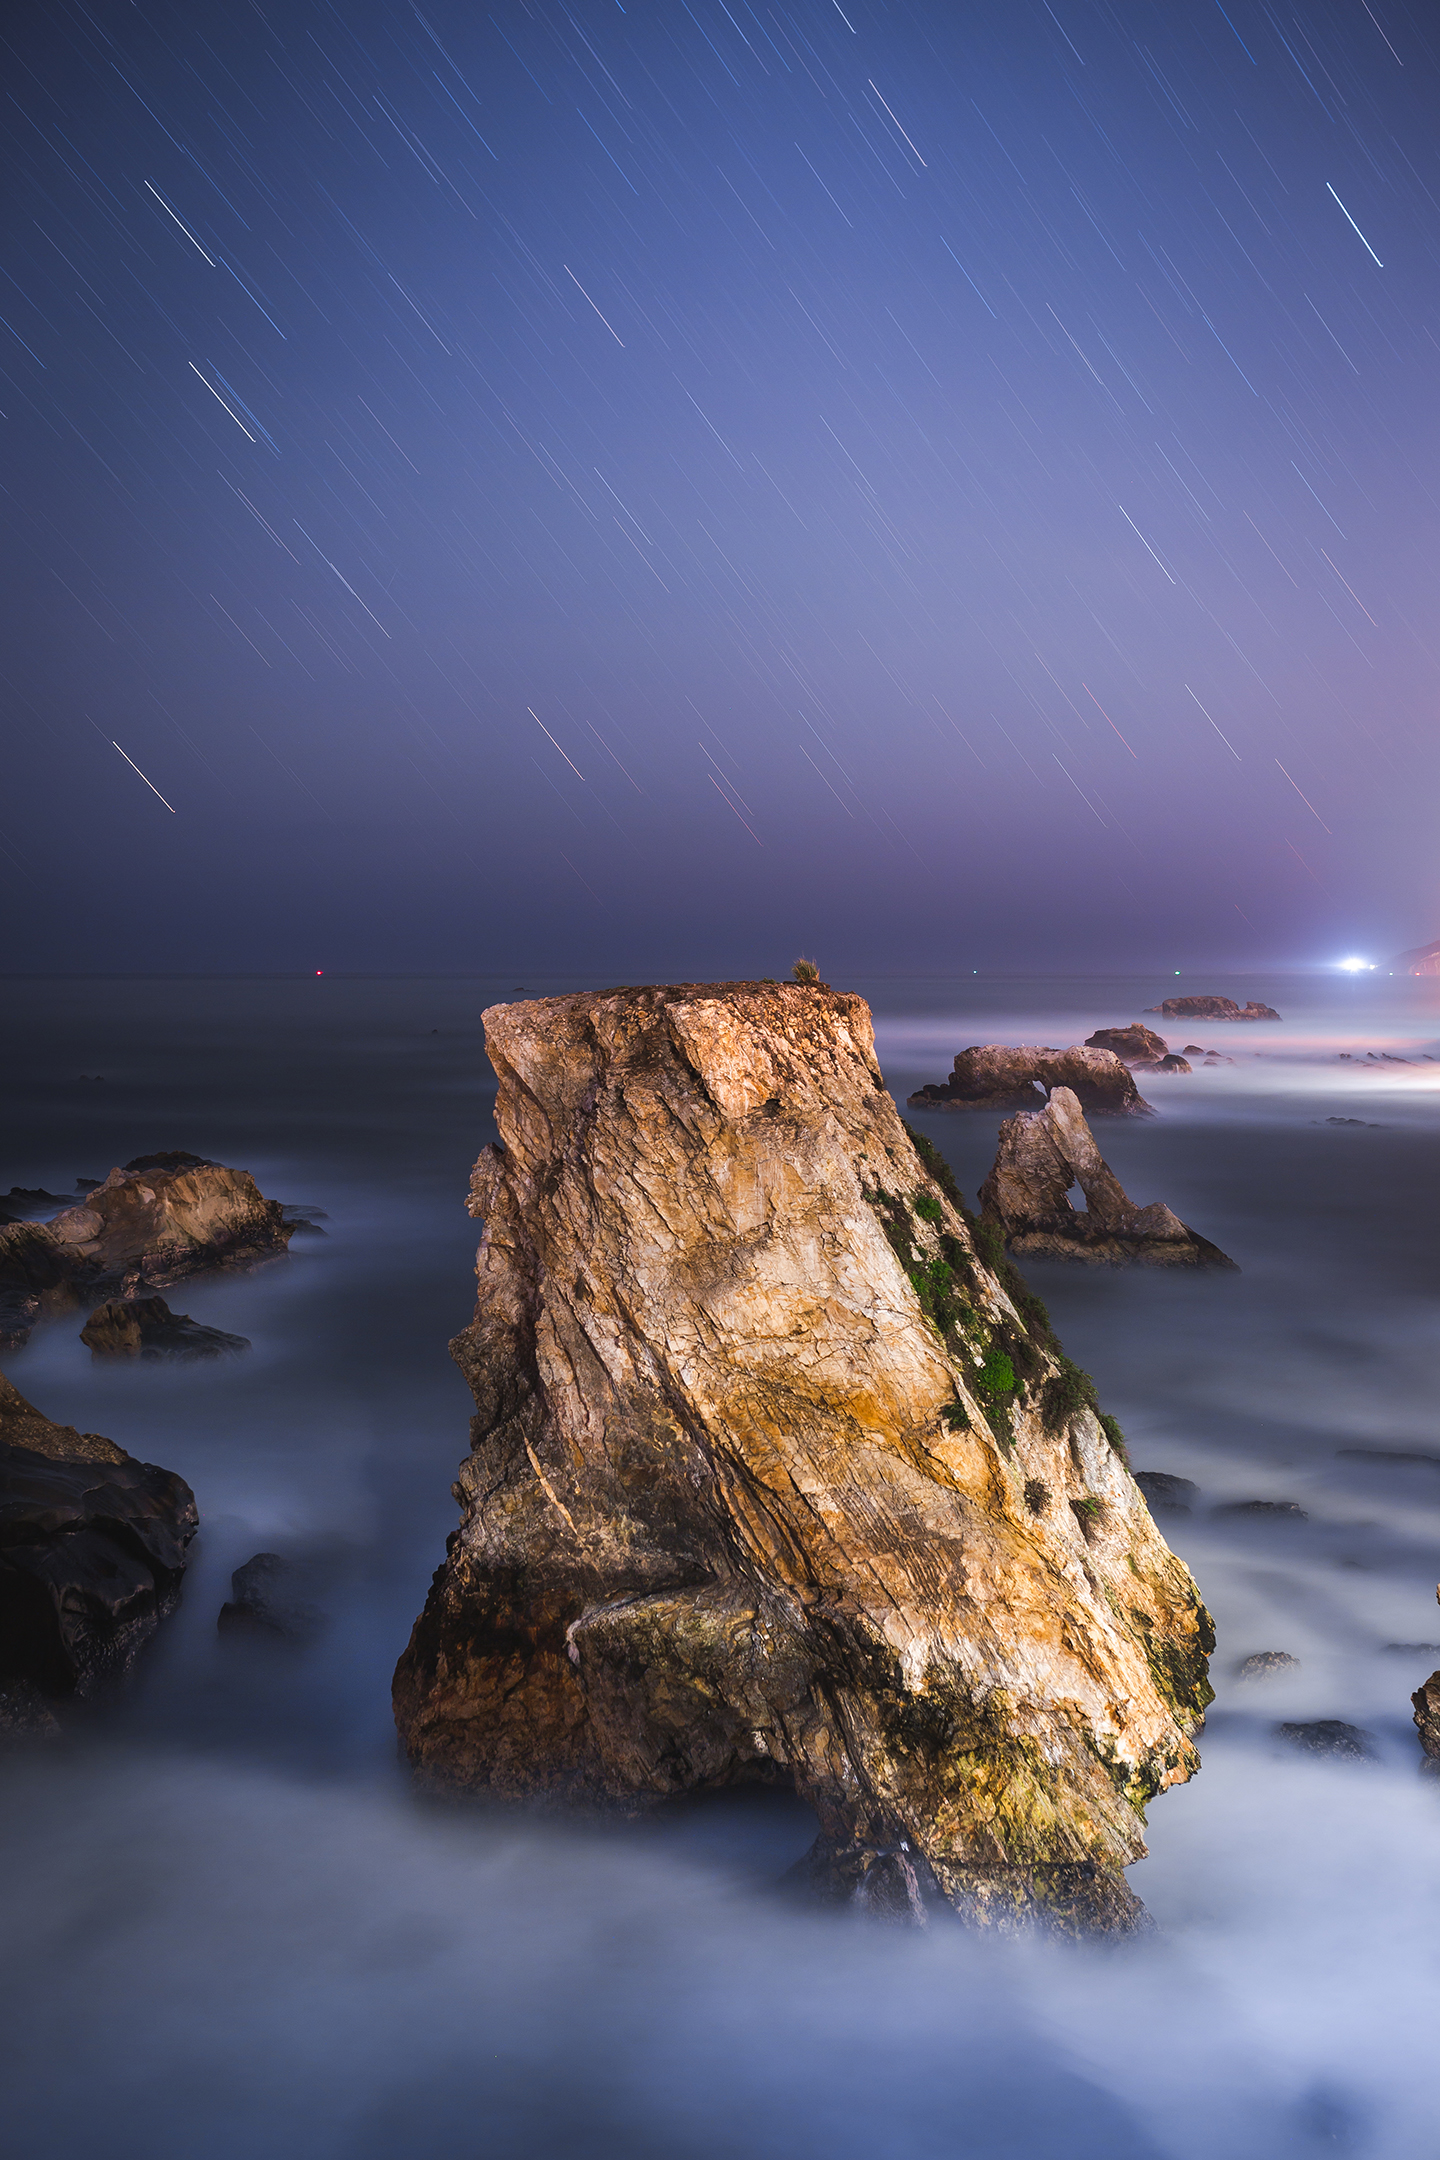 Pismo Beach - Pismo Beach, California // Photographer: Jason Wilson //Canon 5D MK III + Canon 35mm f/1.4L II // ISO 100, f/2.8, 602